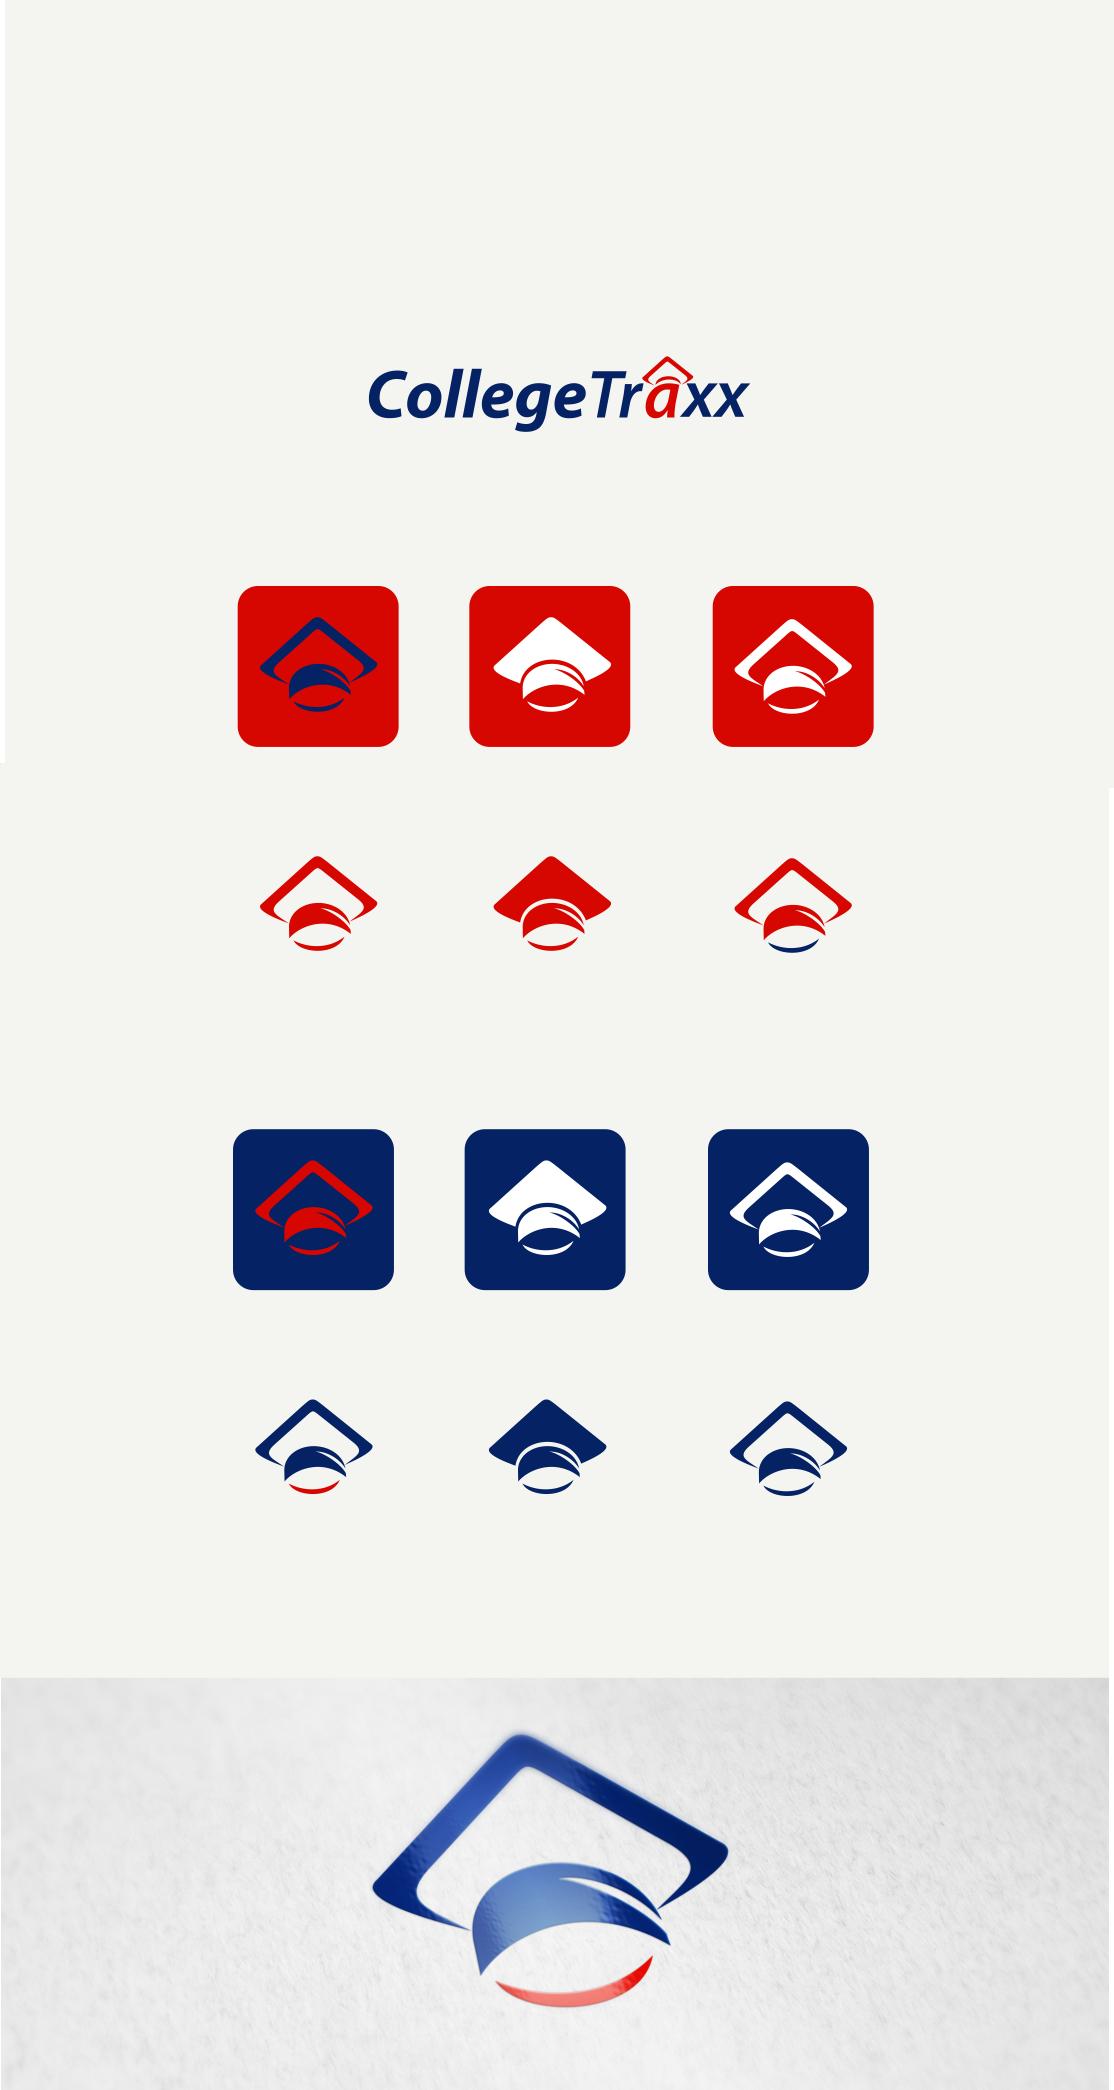 Need a wordmark design for CollegeTraxx